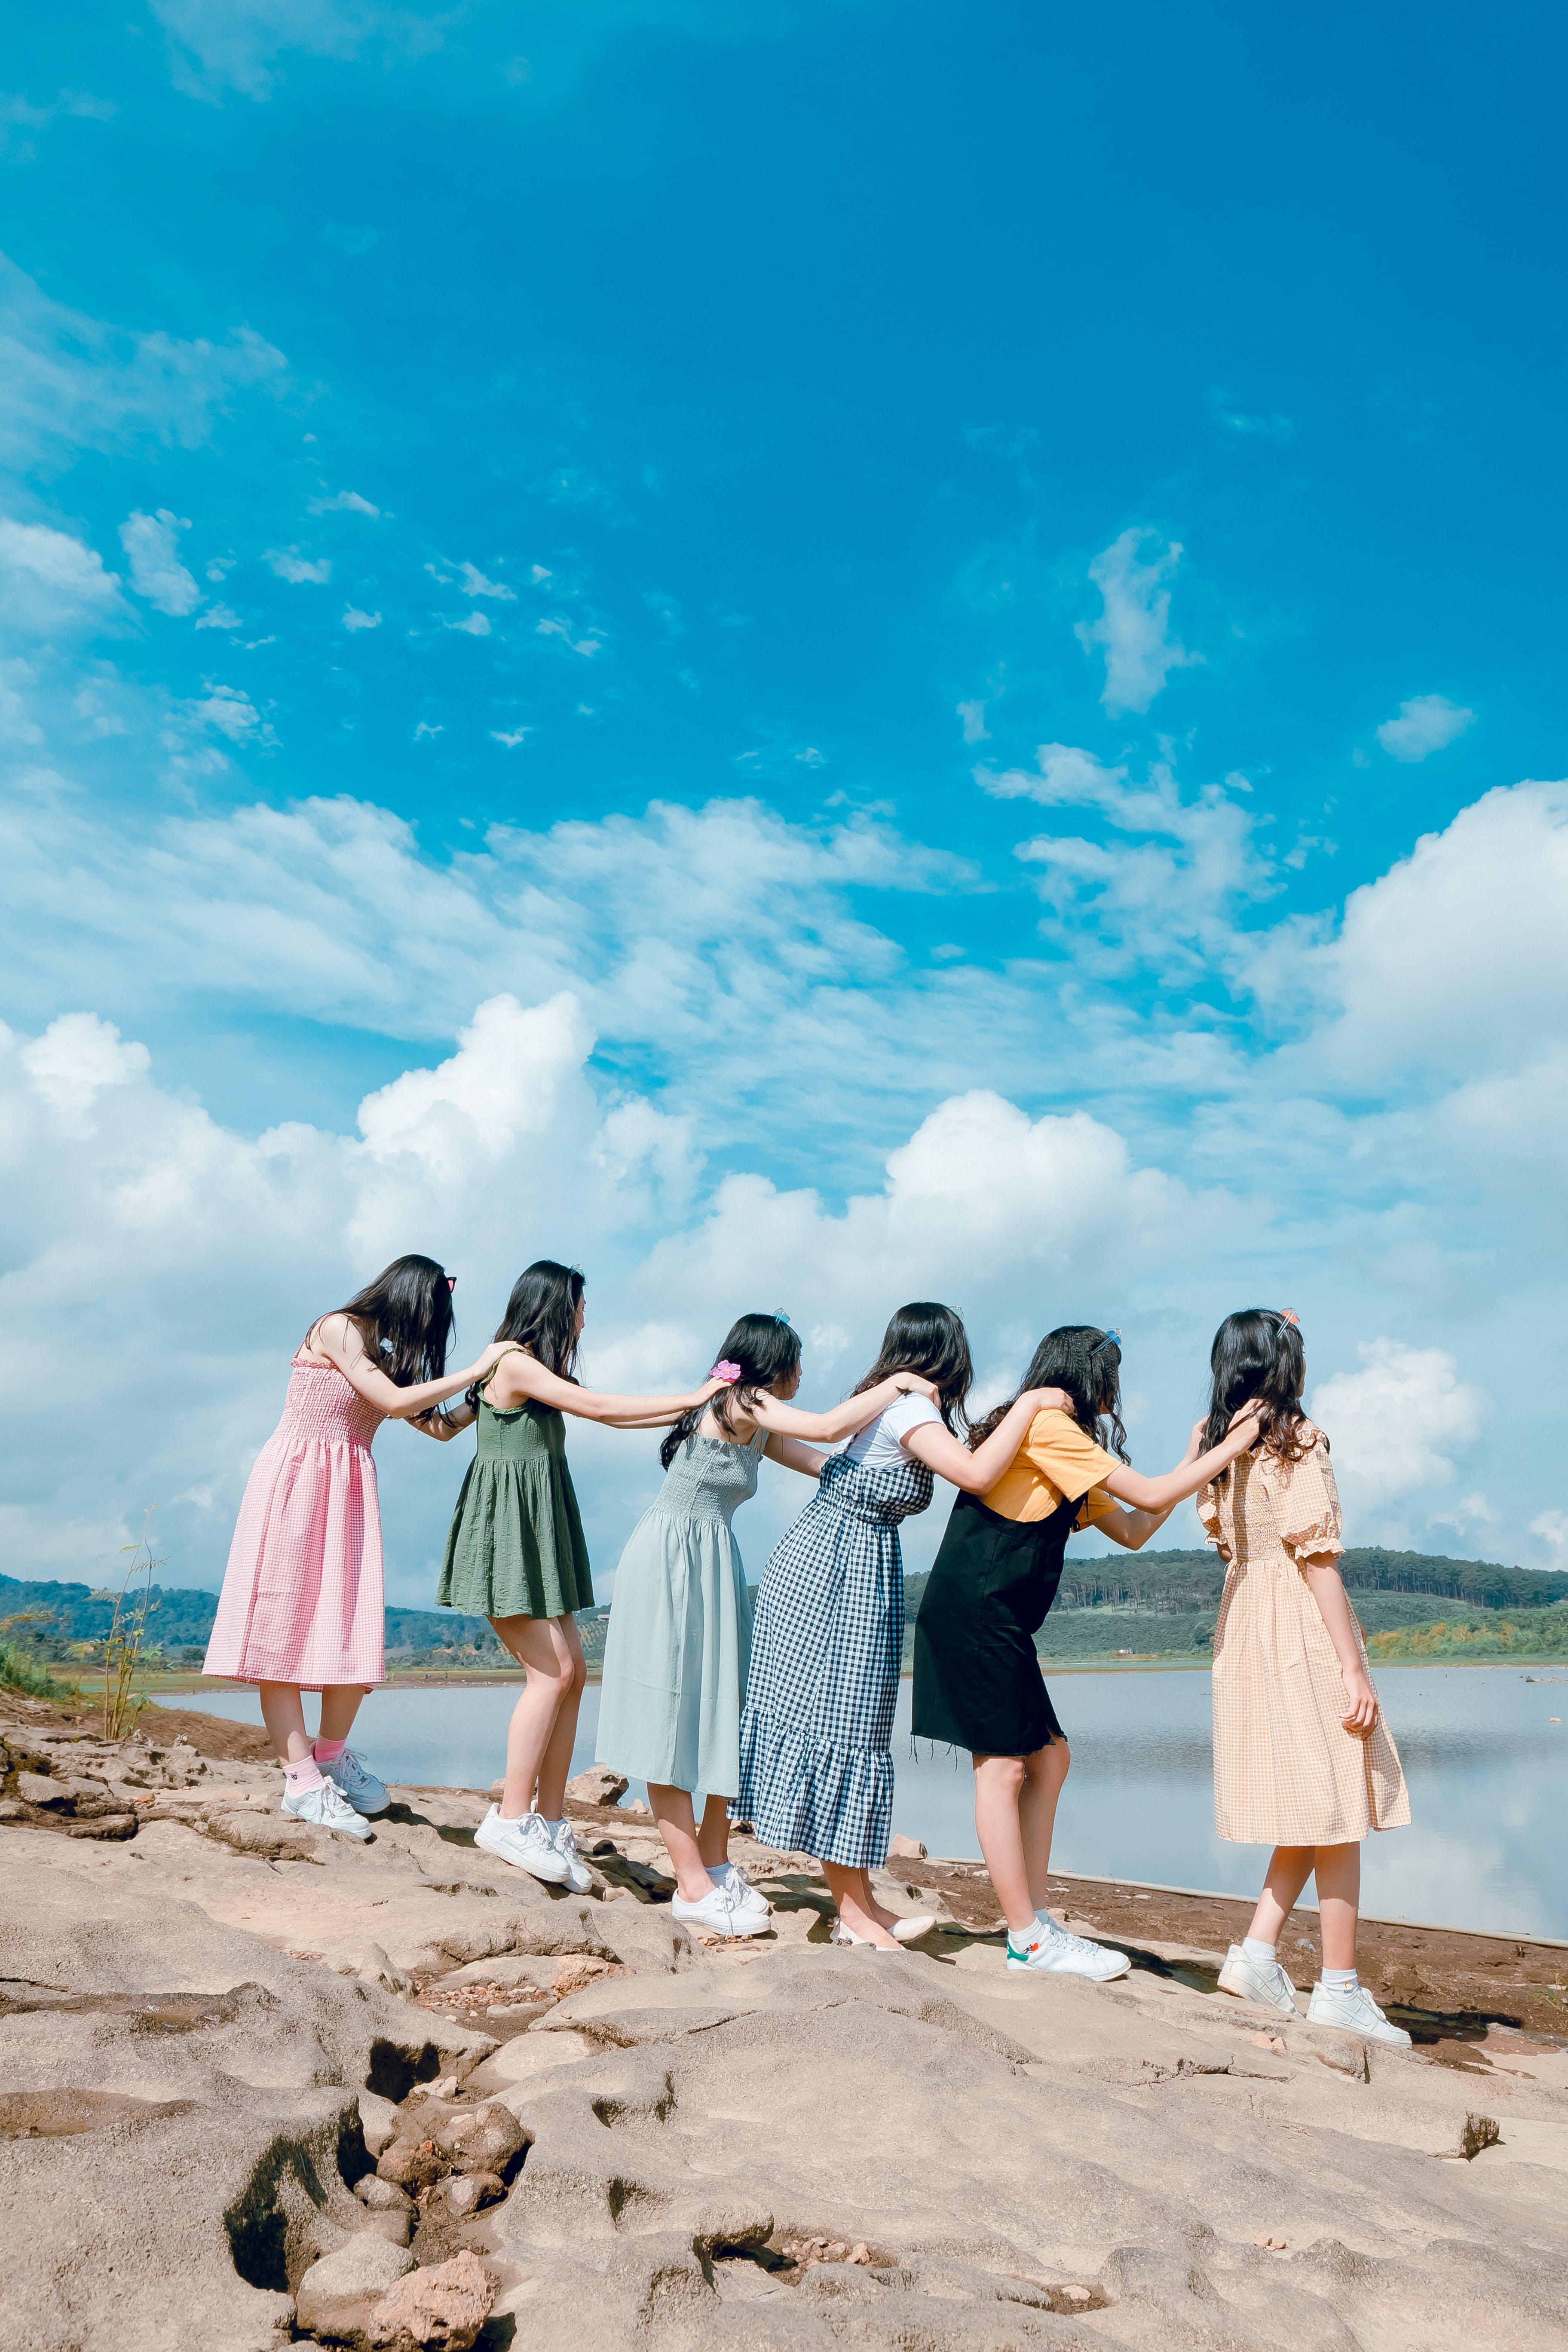 Six Women Lining Up